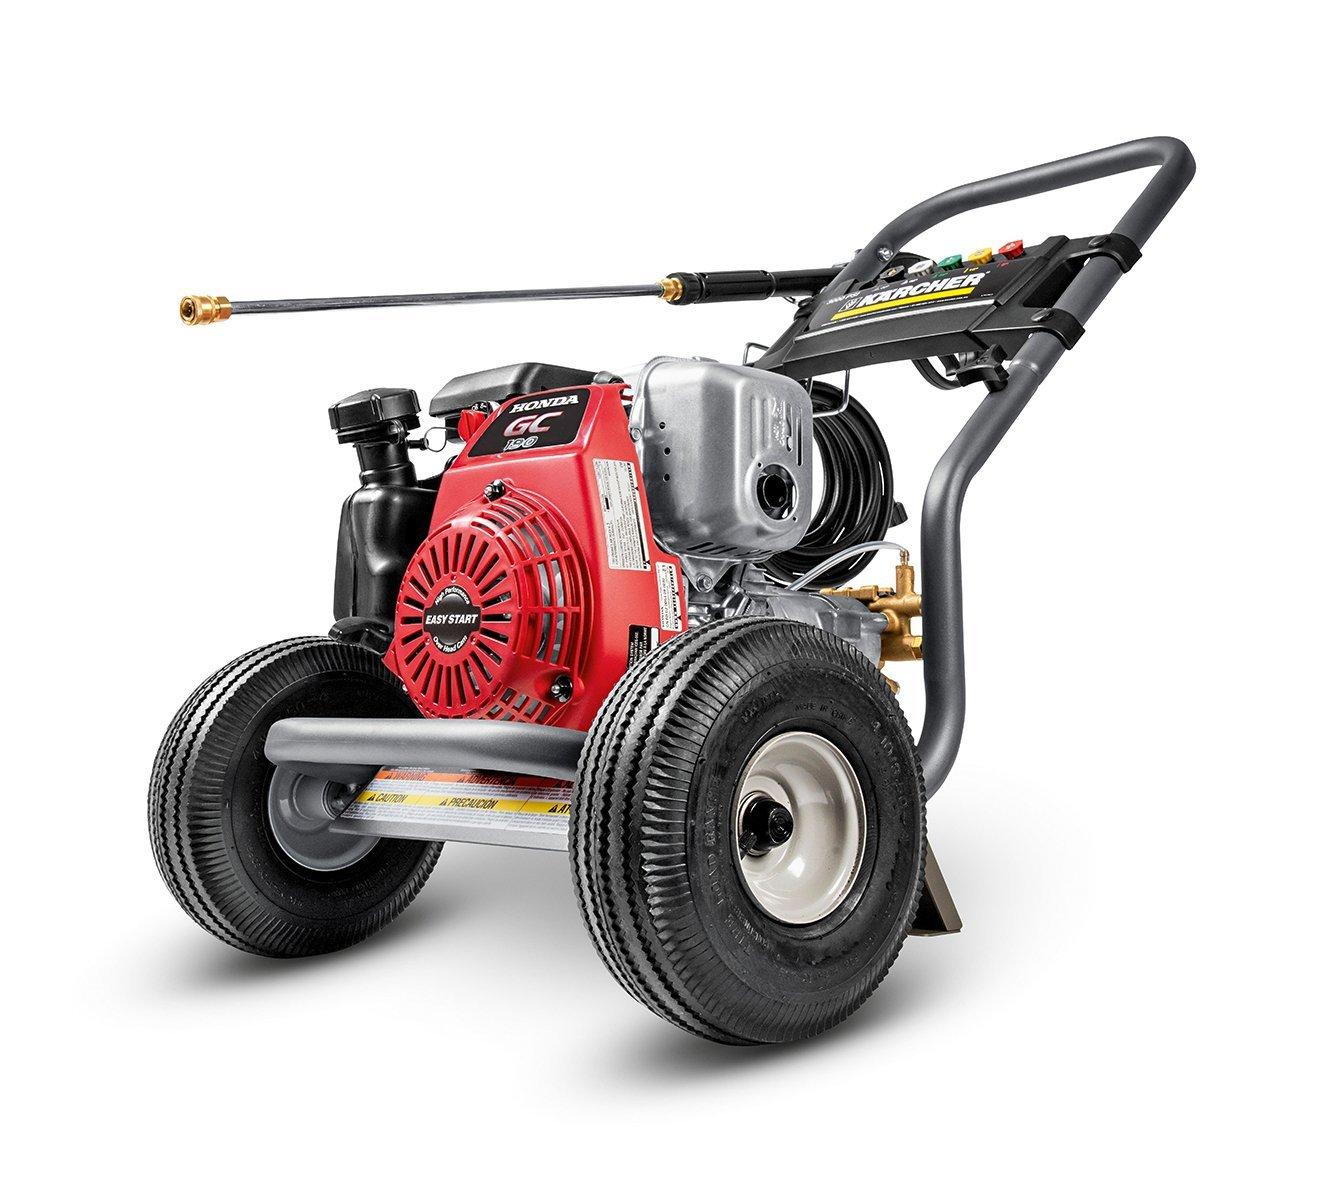 Amazon.com : Karcher G3000OH Gas Power Pressure Washer, Honda Engine